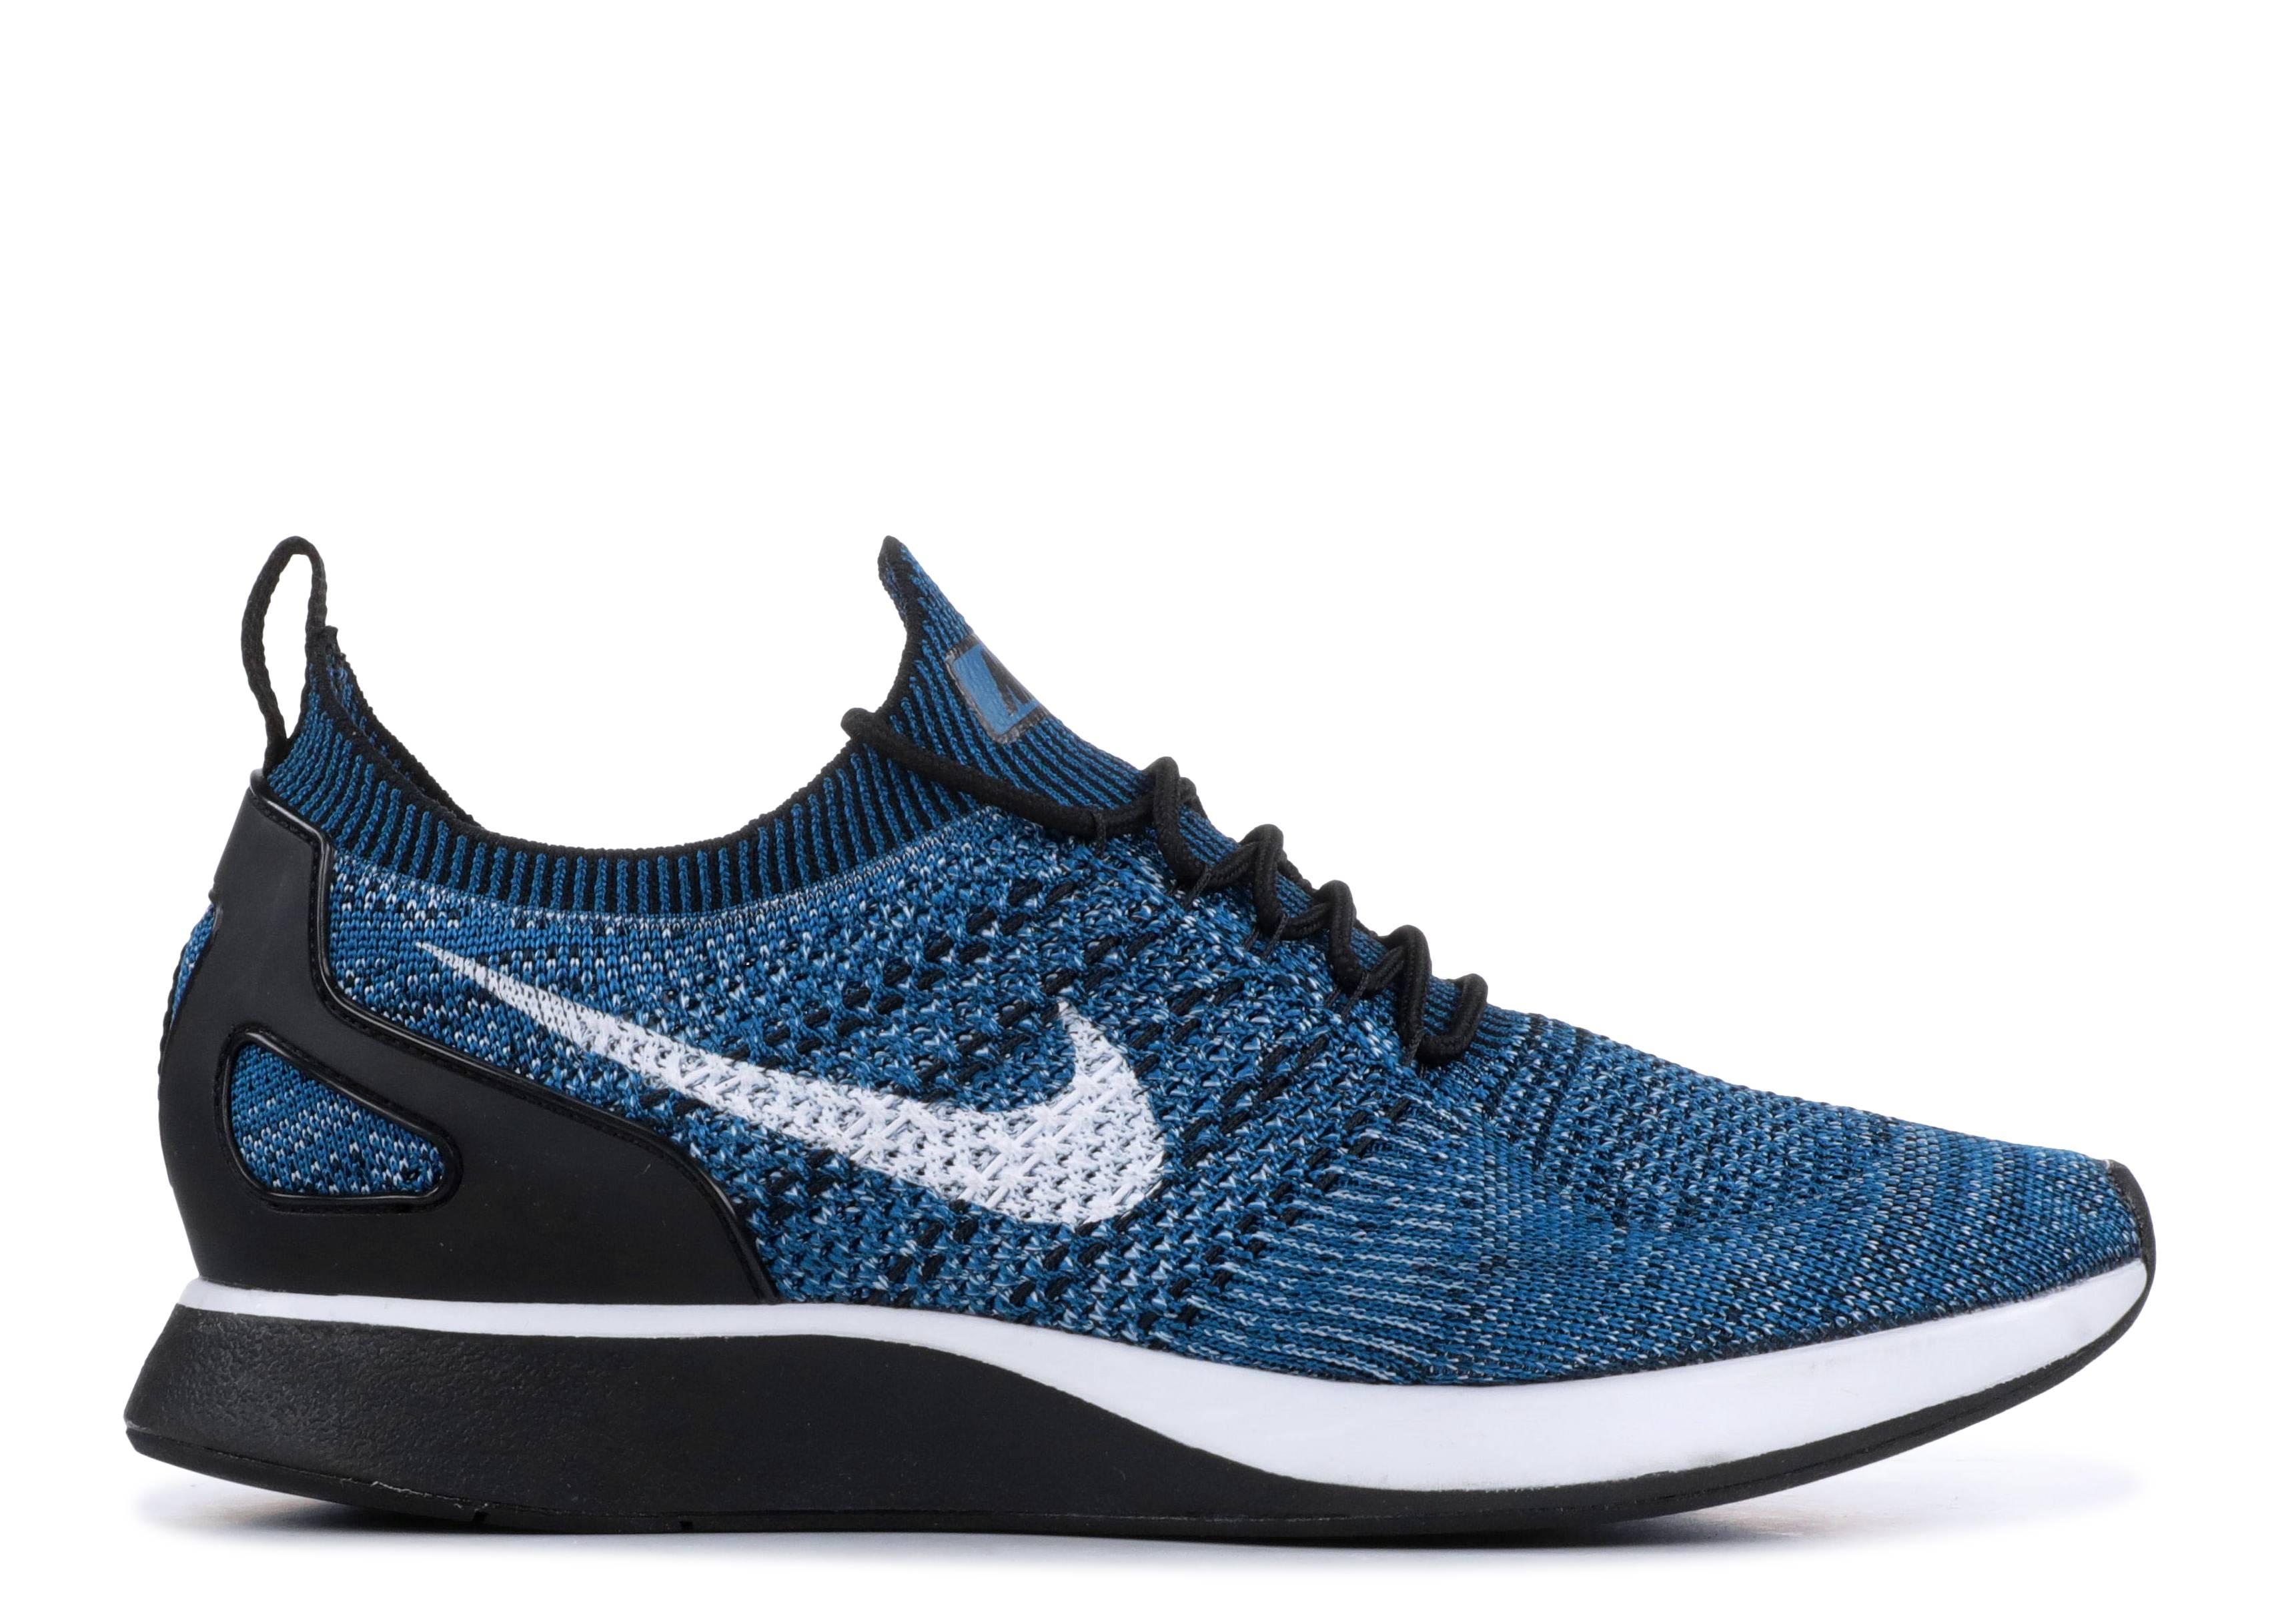 397ec571856ba Nike Air Zoom Mariah Flyknit Racer